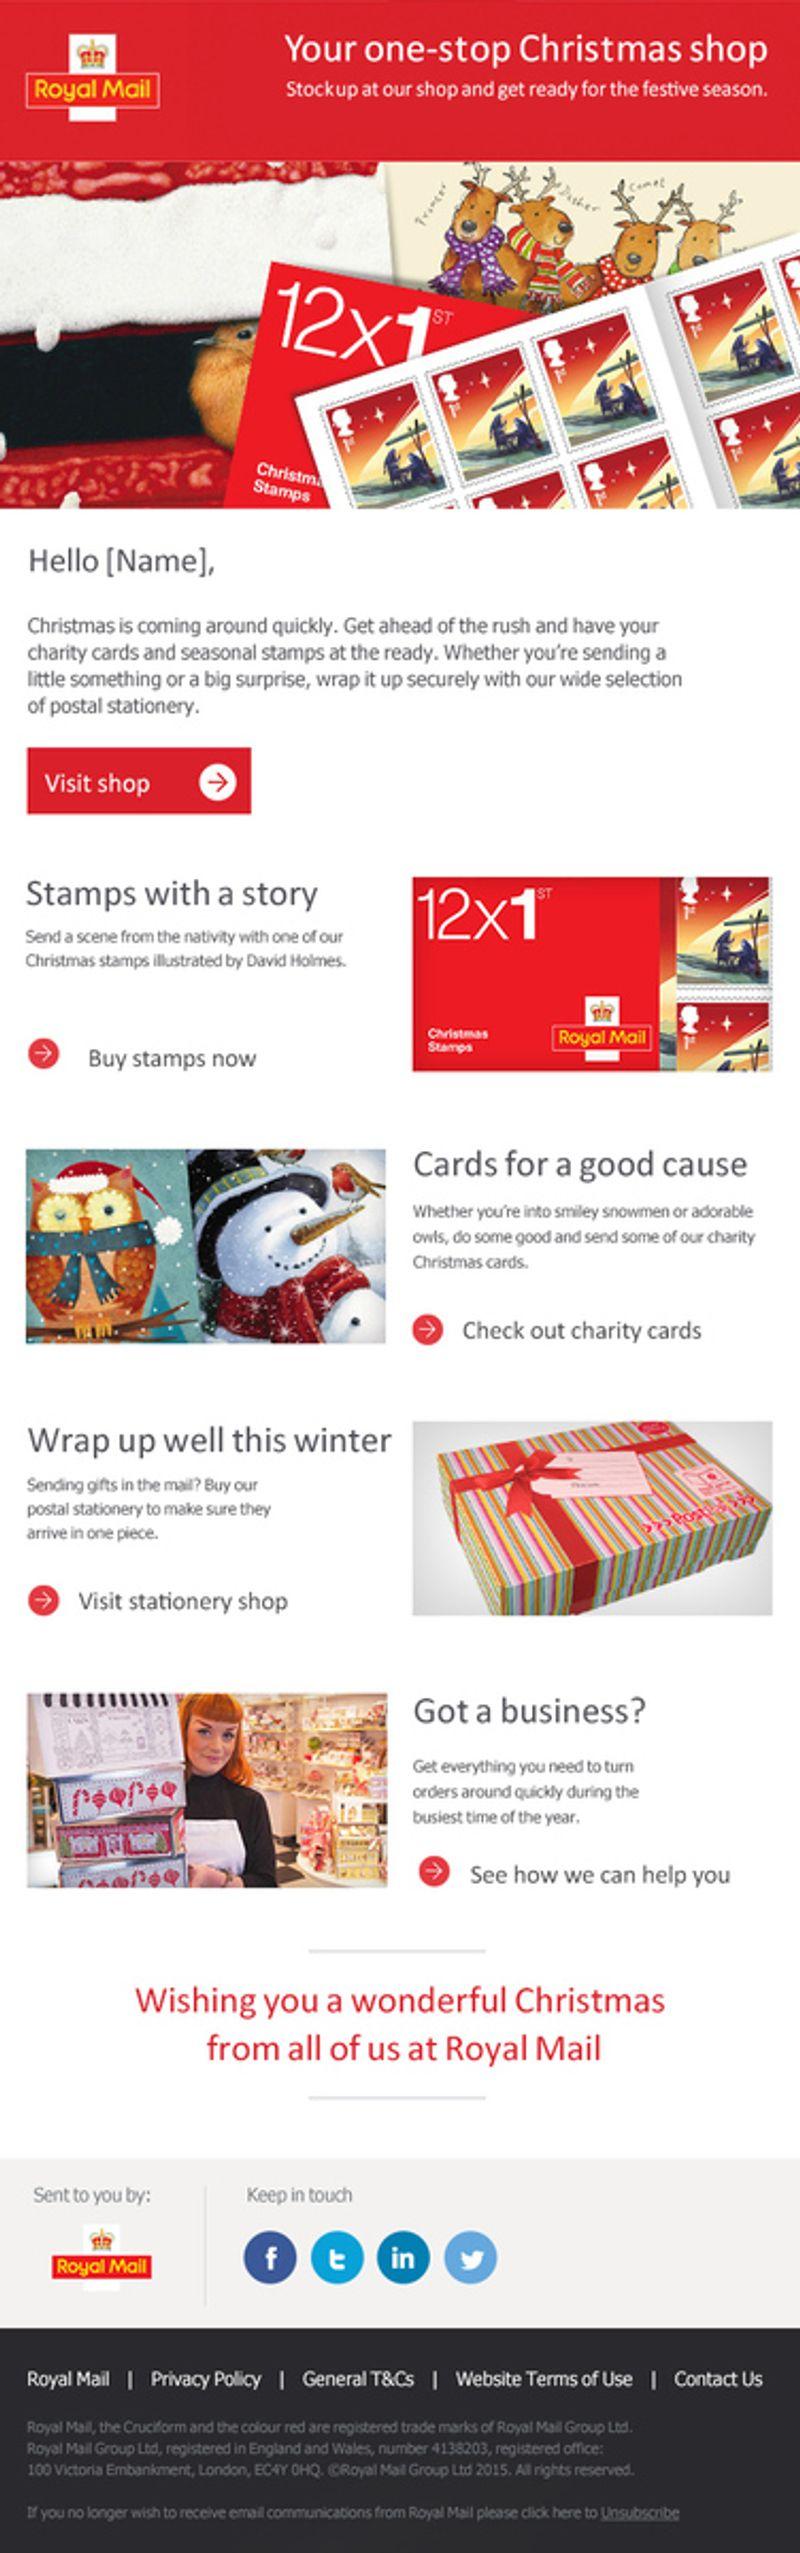 Royal Mail Christmas Business Web Design